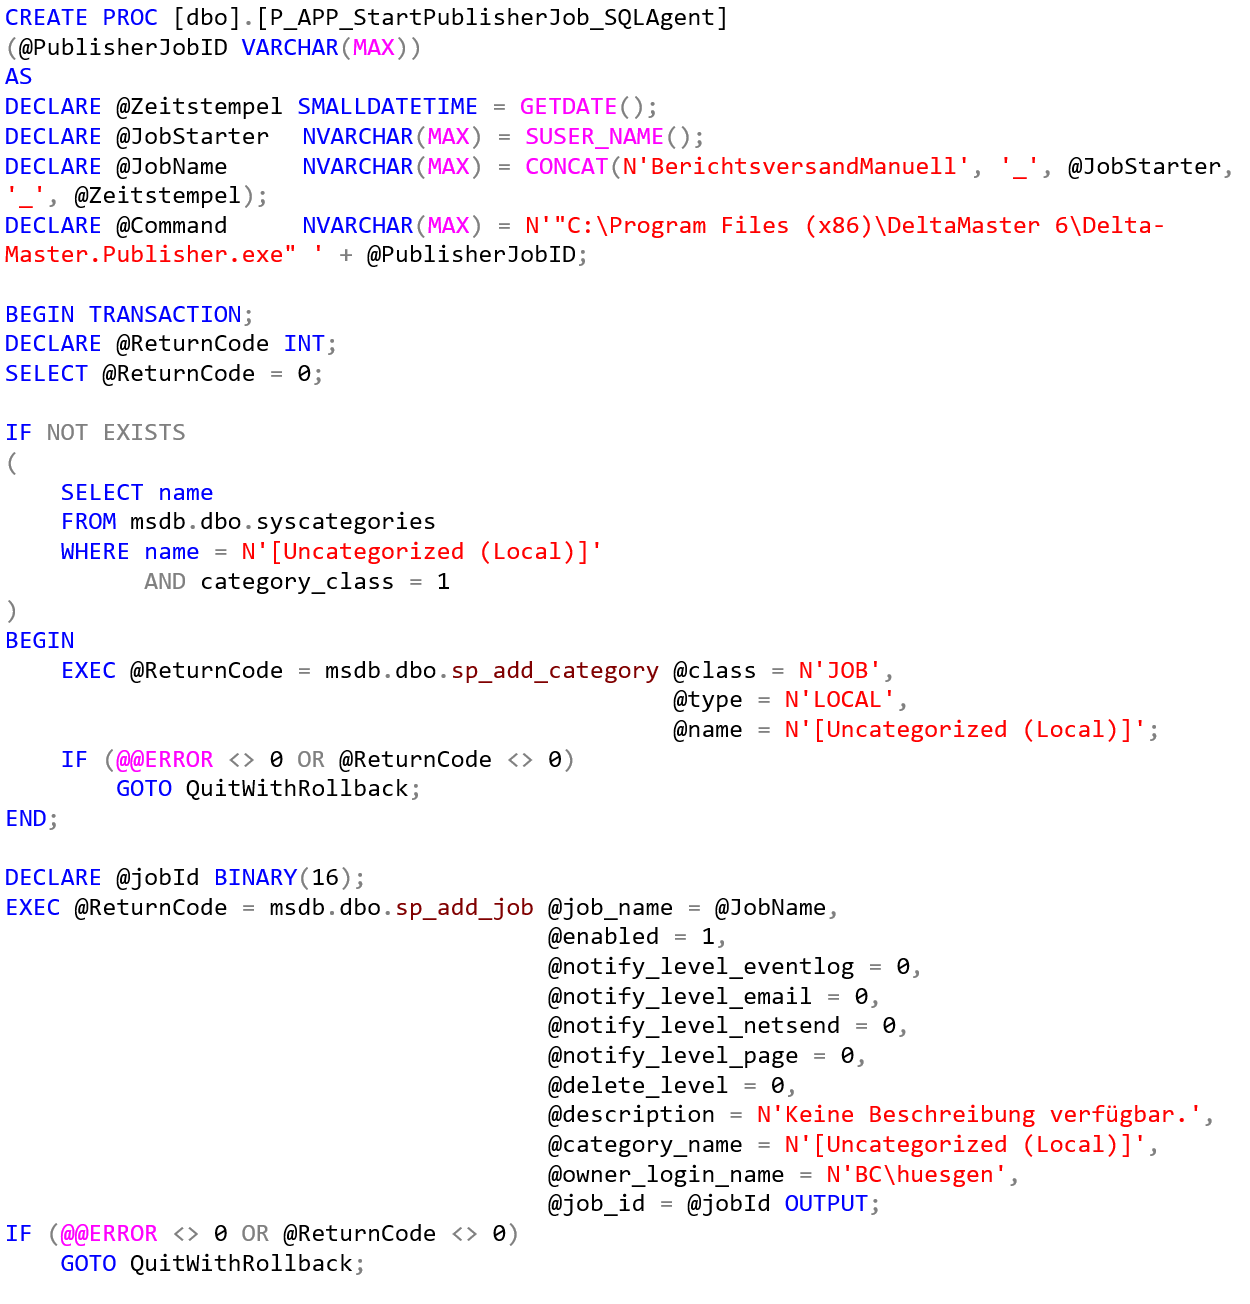 2020-11-06_Crew_Dynamische-Publisher-Jobs-ueber-Custom-App_1.3-Code-Prozeduren-und-Logik.png